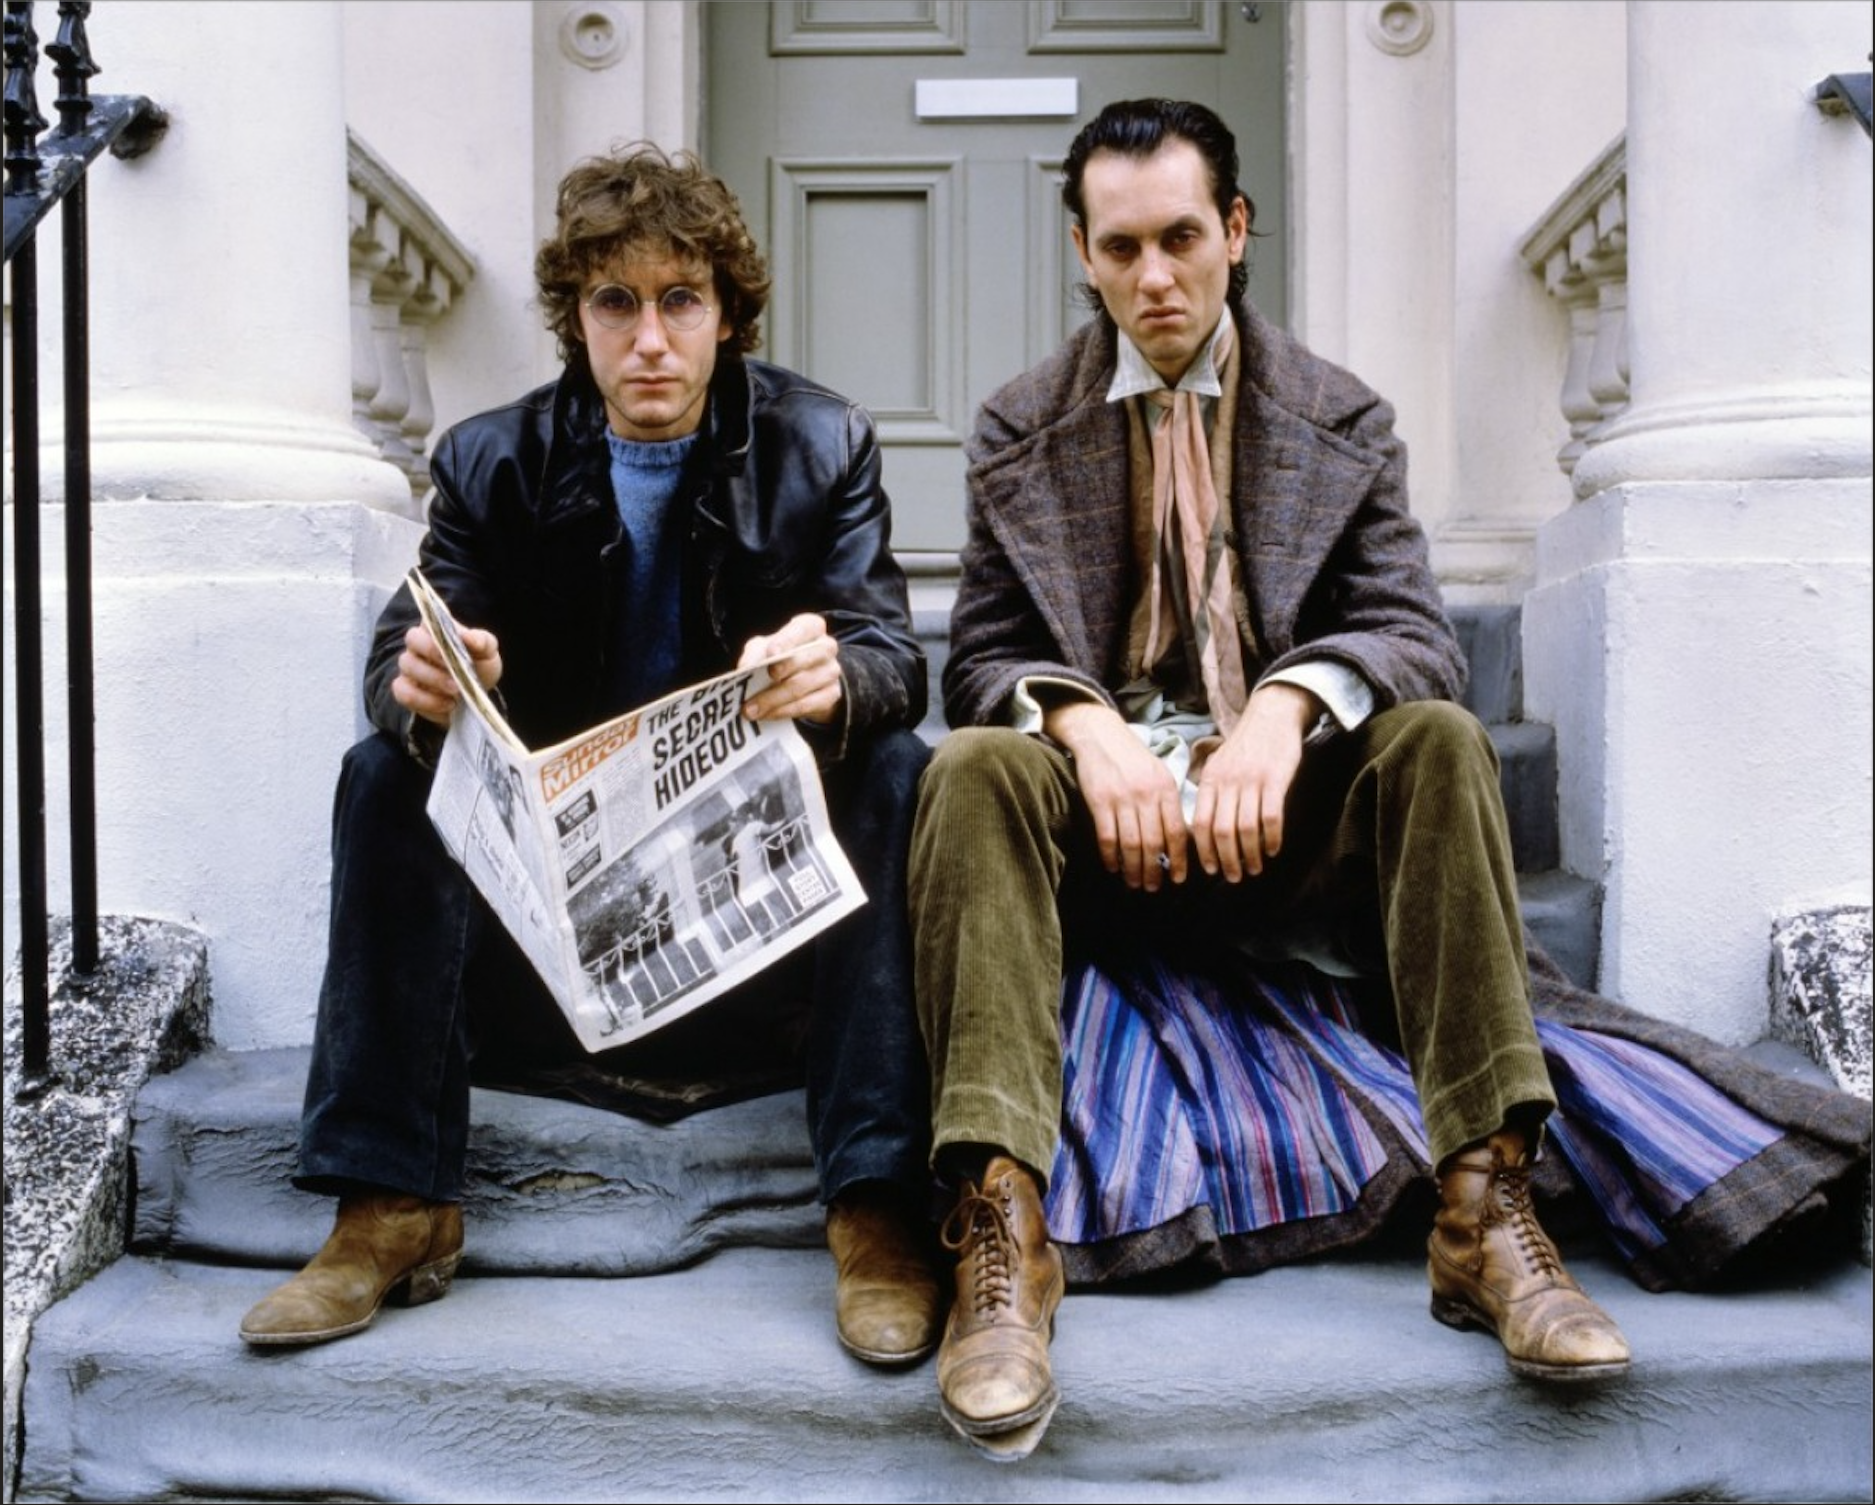 Withnail and I: Psychotropic Cinema